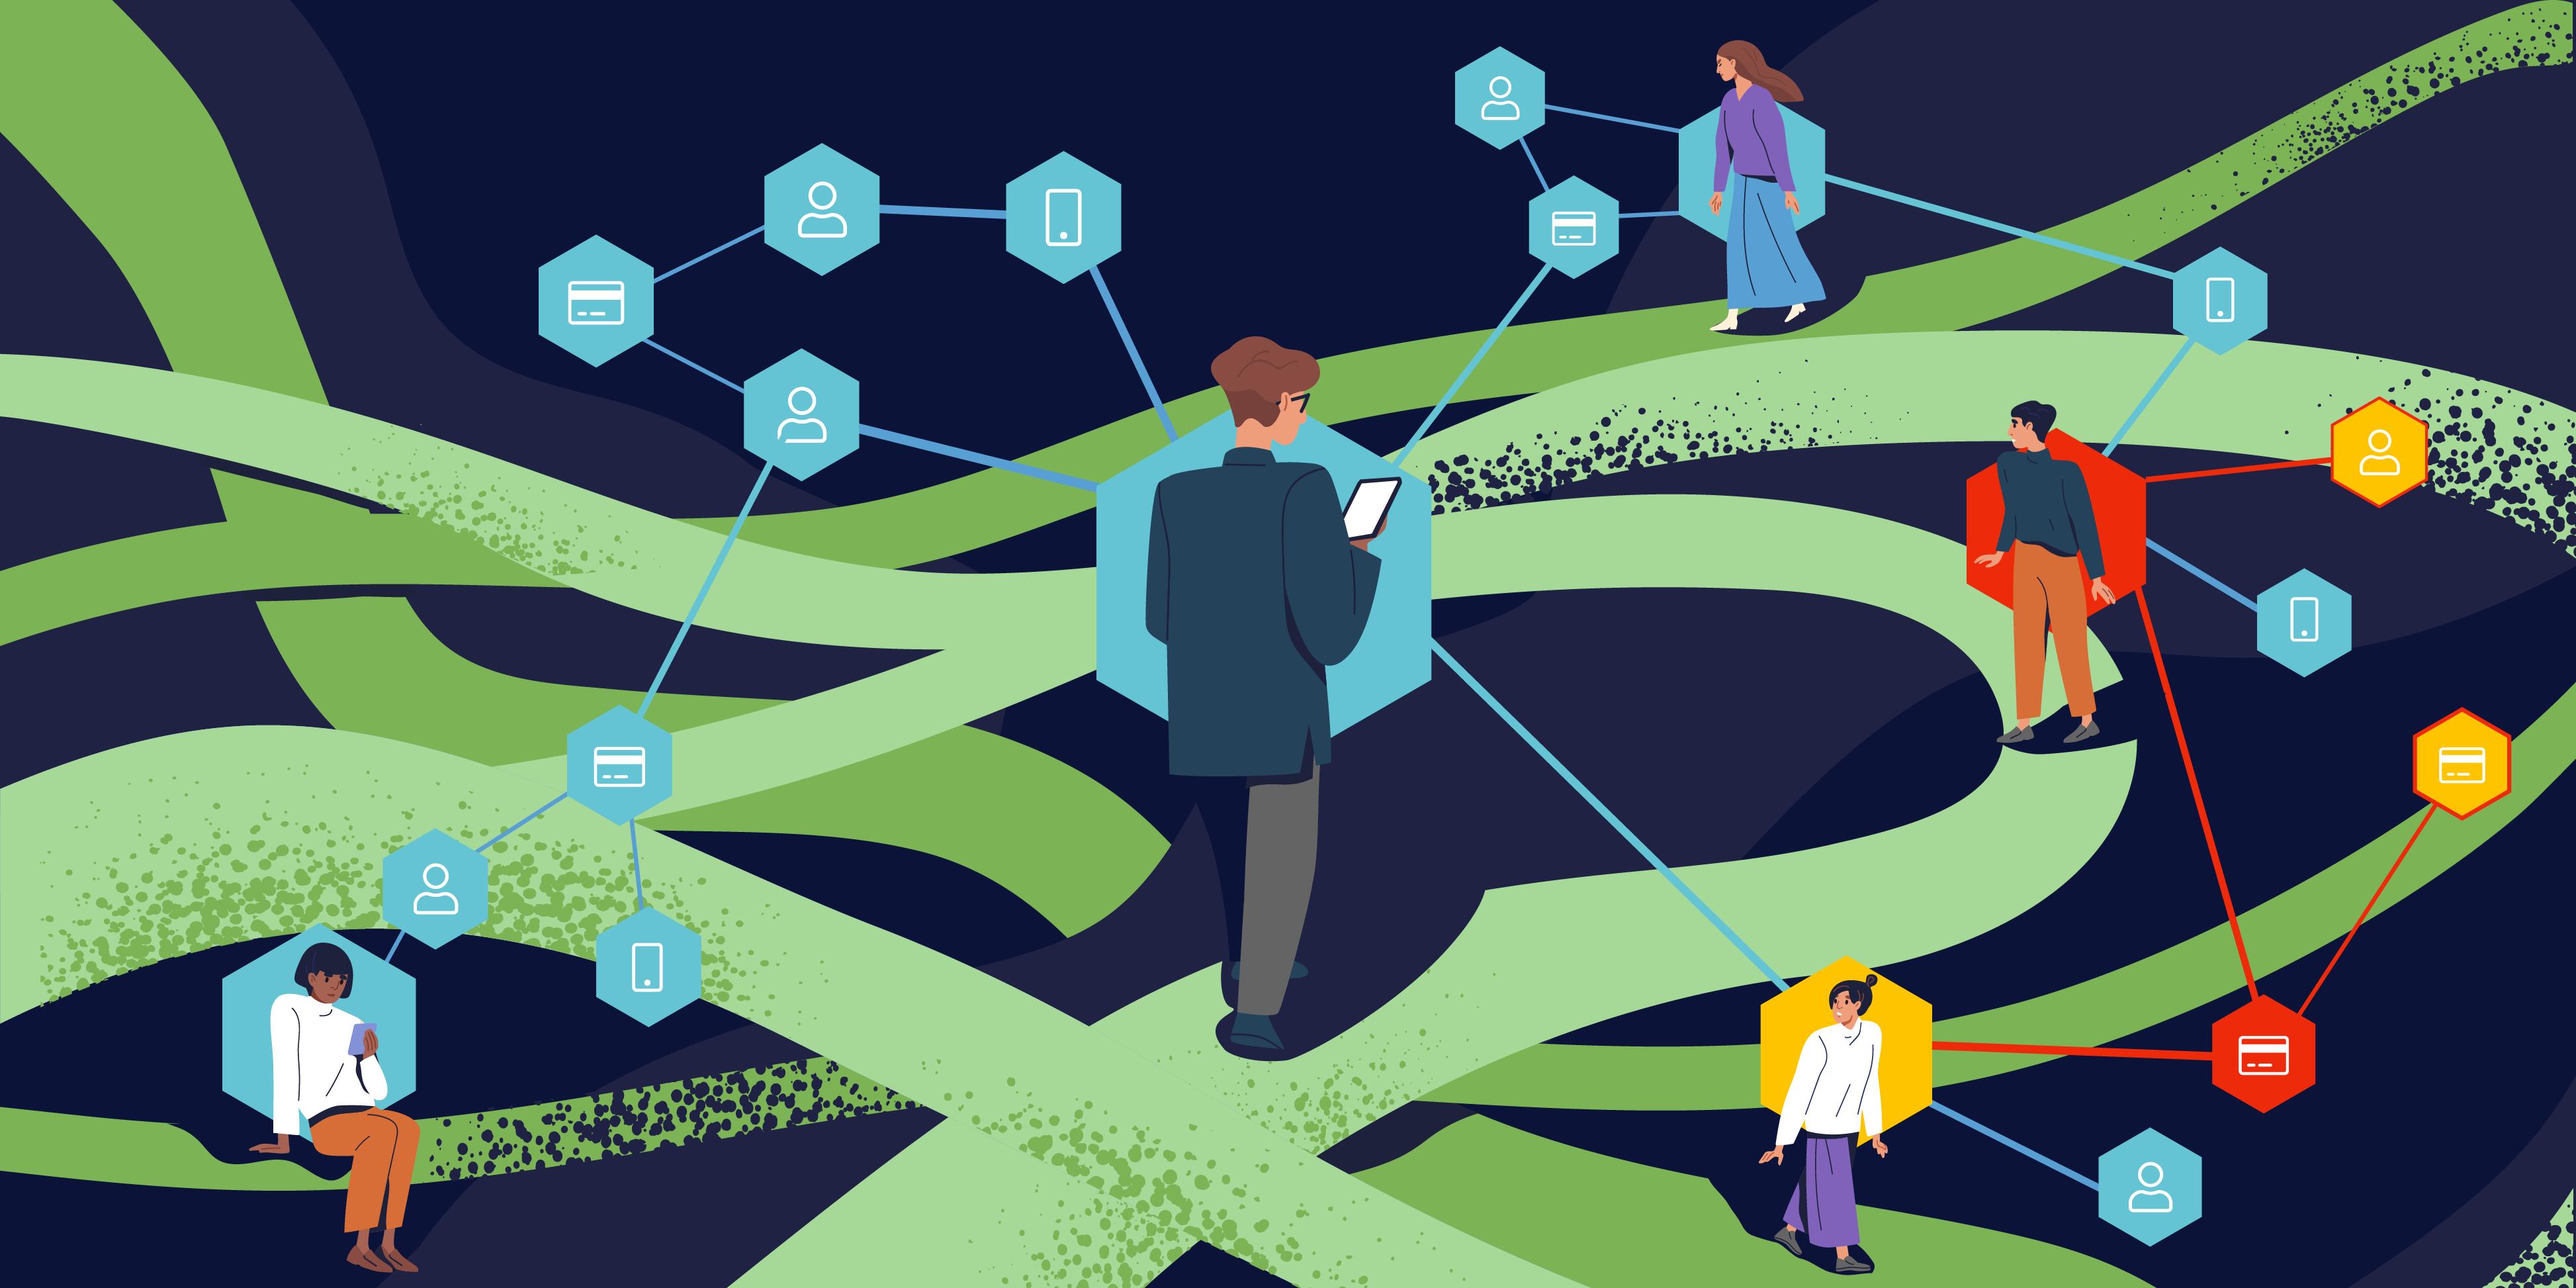 Illustration of Feedzai Genome visually detecting fraud